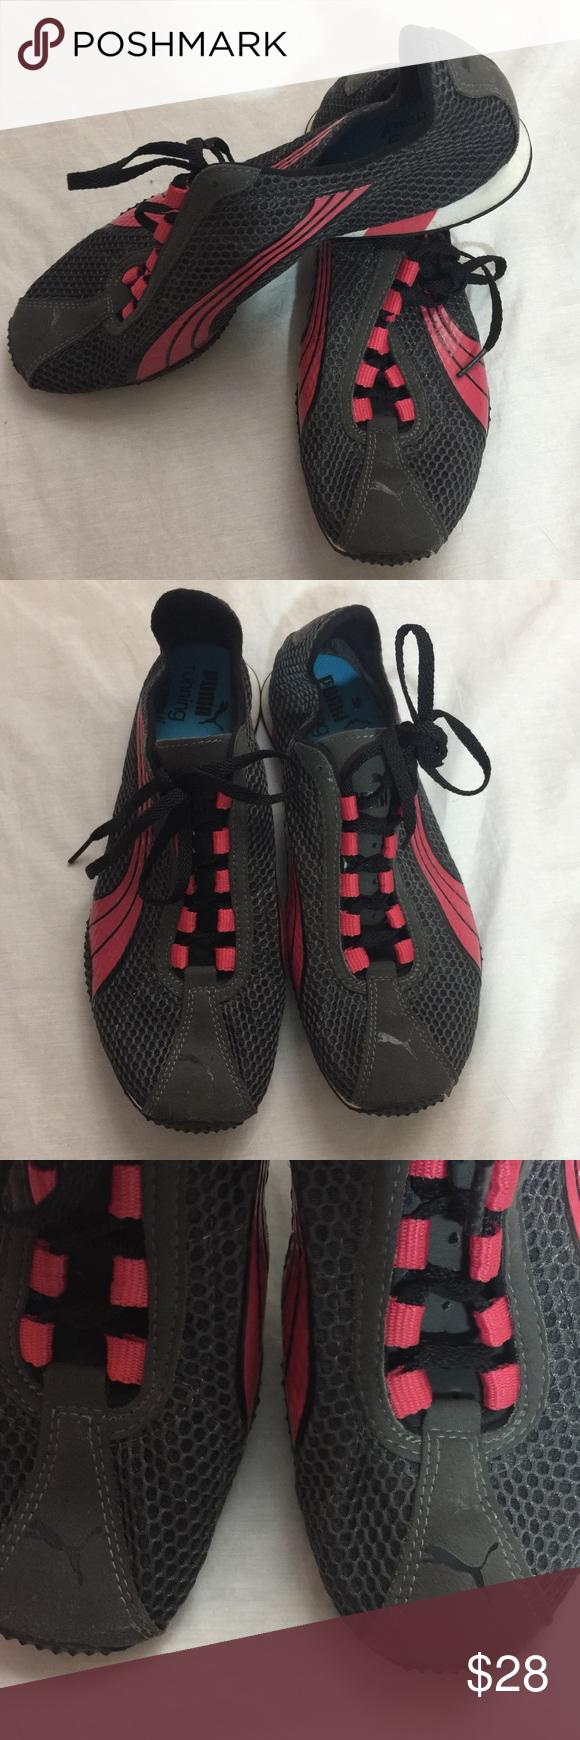 430c5372308 Puma running eco ortholite Woman s size 9 Puma running eco ortholite Woman s  size 9 Gray and pink Lightweight running shoe Great condition